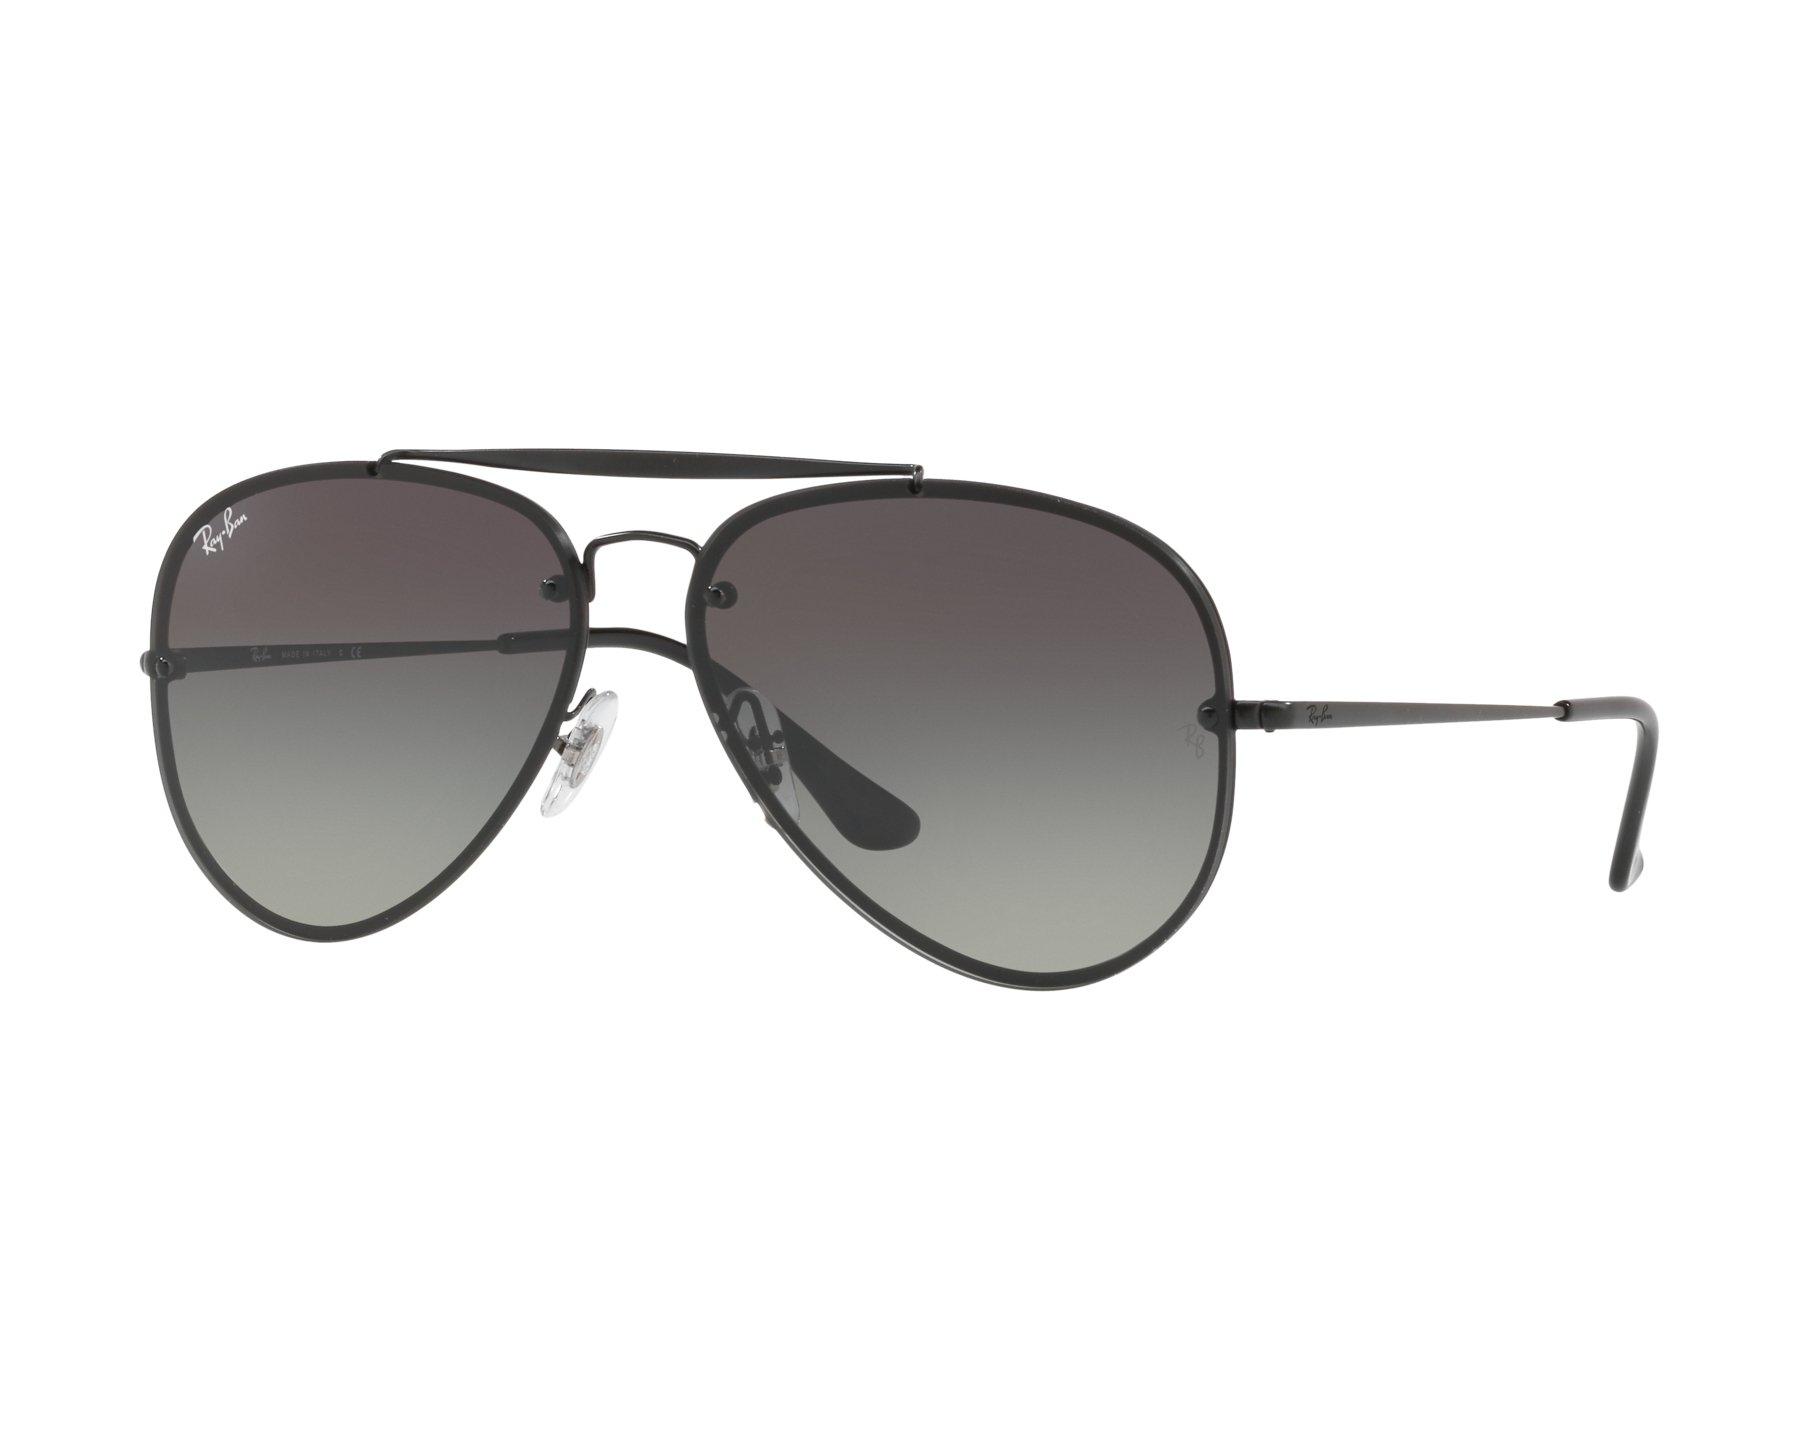 RAY BAN RAY-BAN Sonnenbrille »BLAZE AVIATOR RB3584N«, schwarz, 153/11 - schwarz/grau